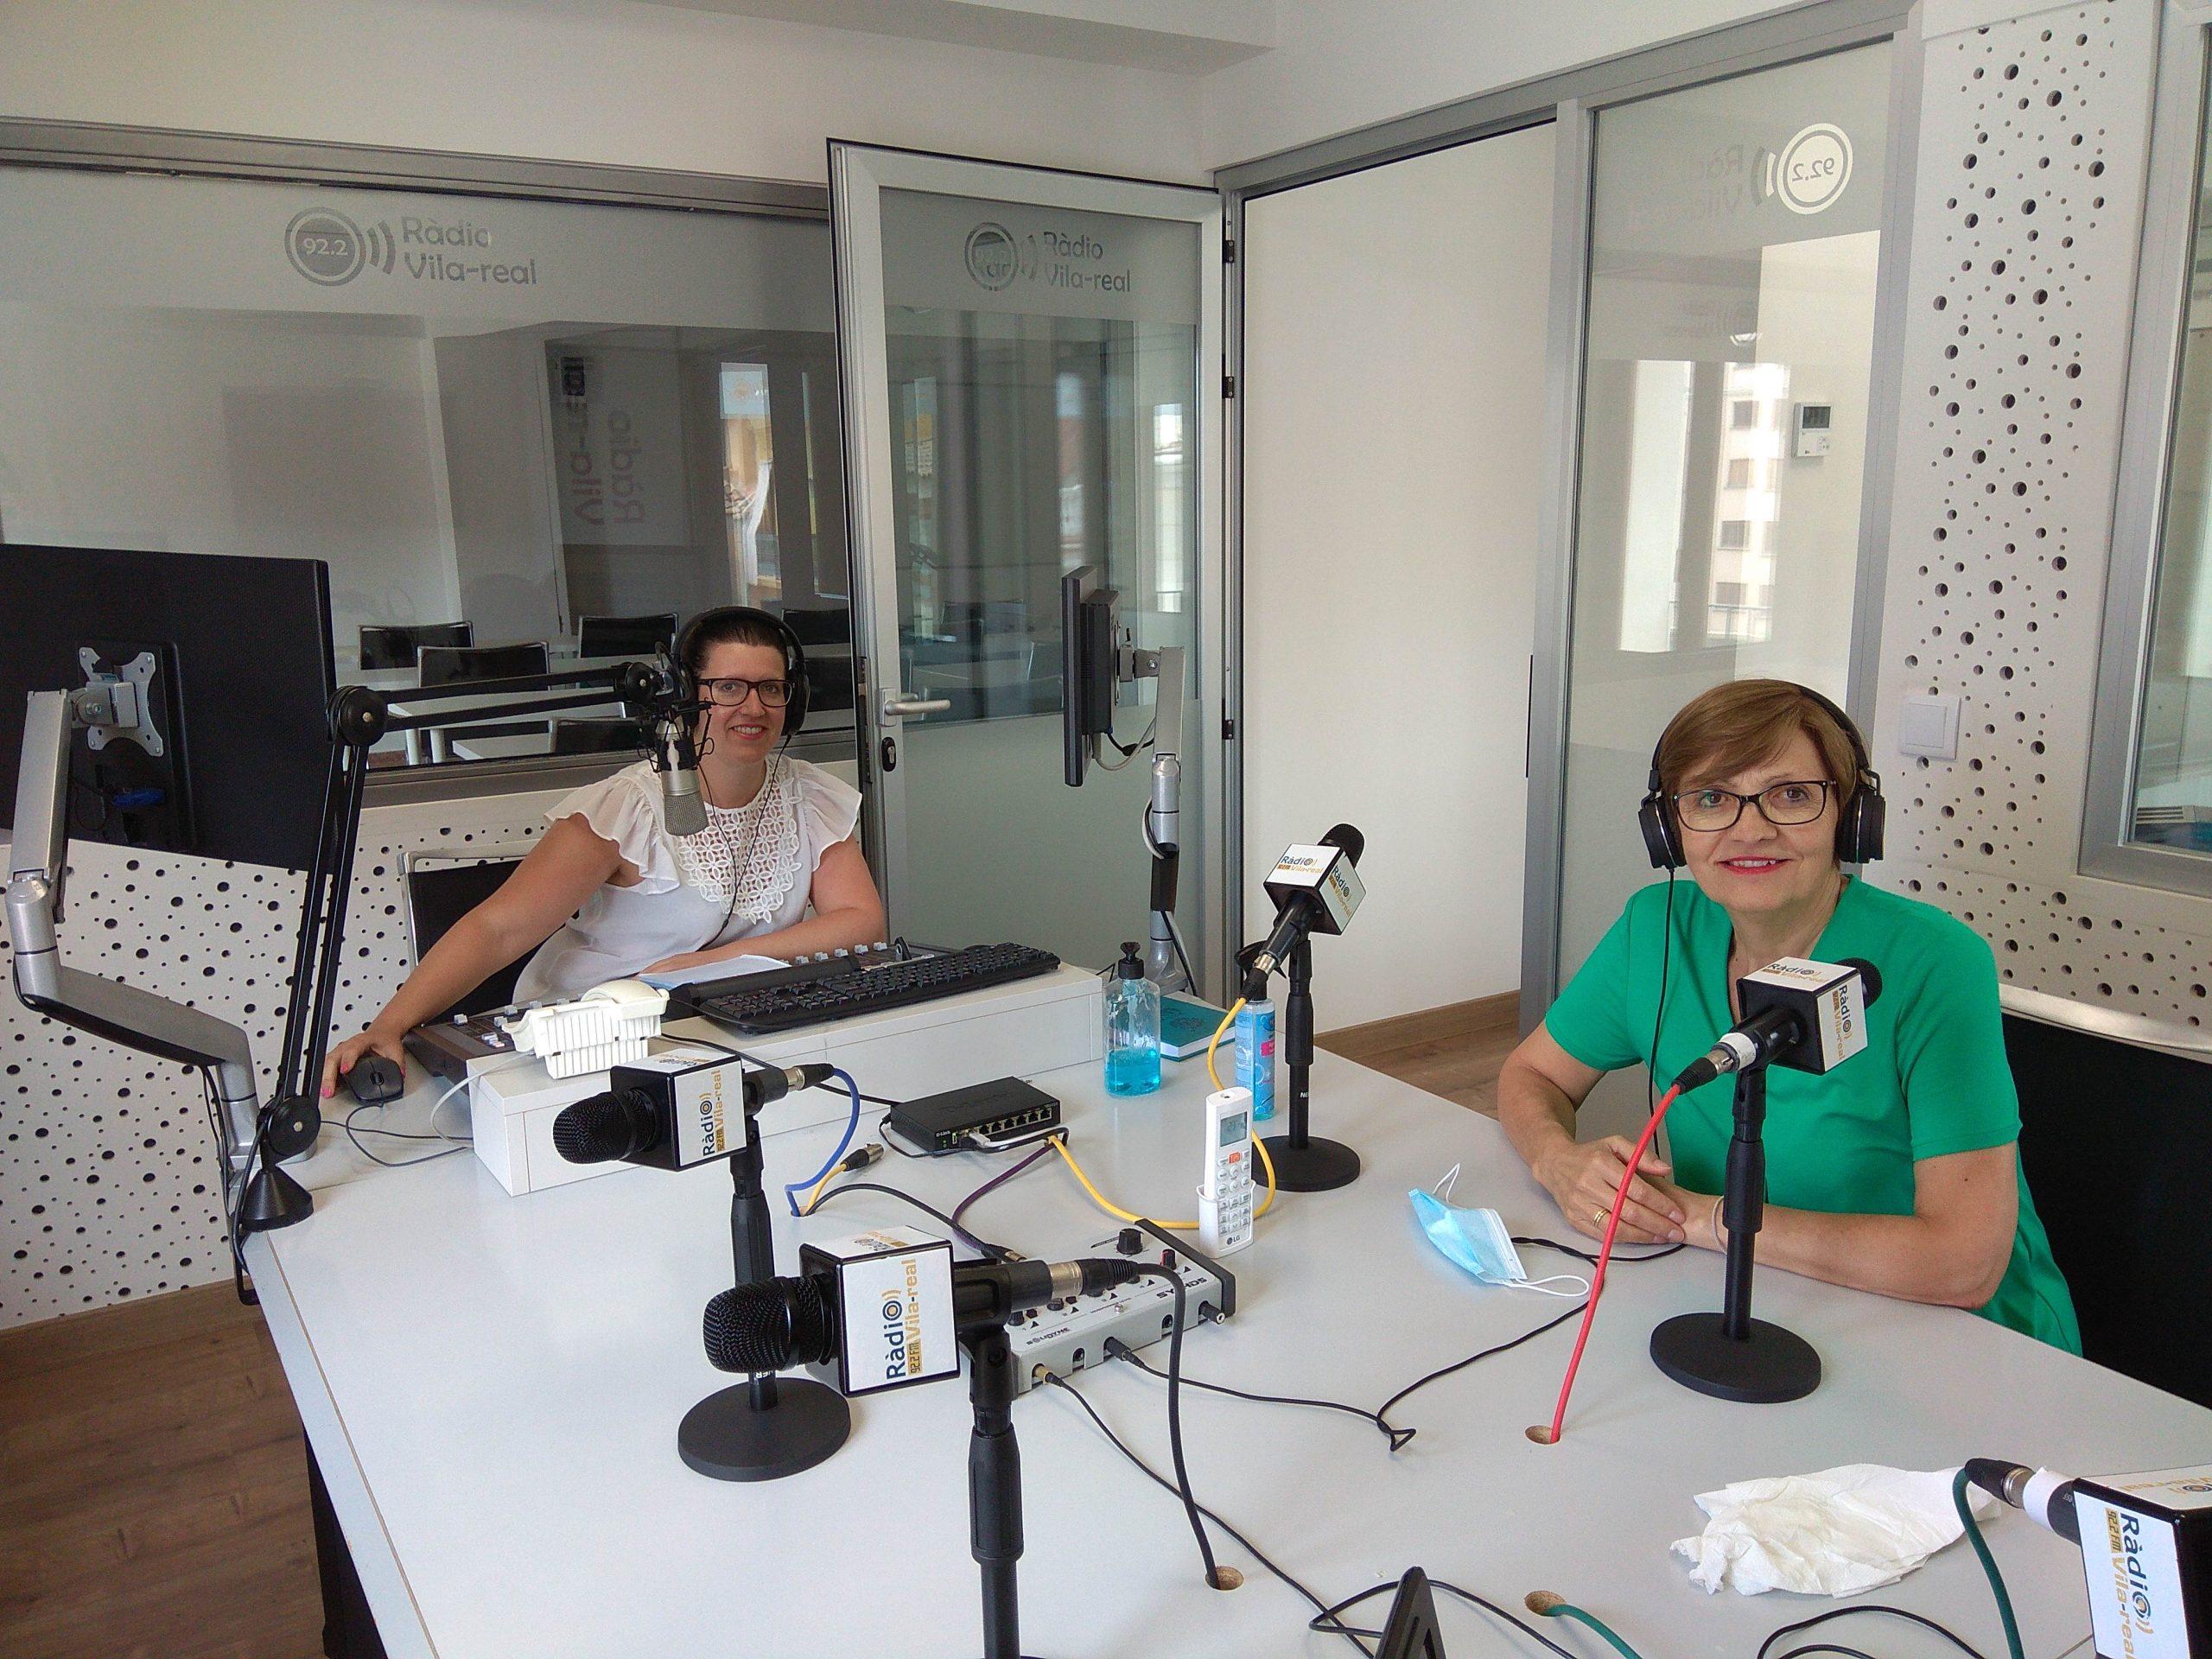 Entrevista a la concejala de Cultura de Vila-real, Rosario Royo